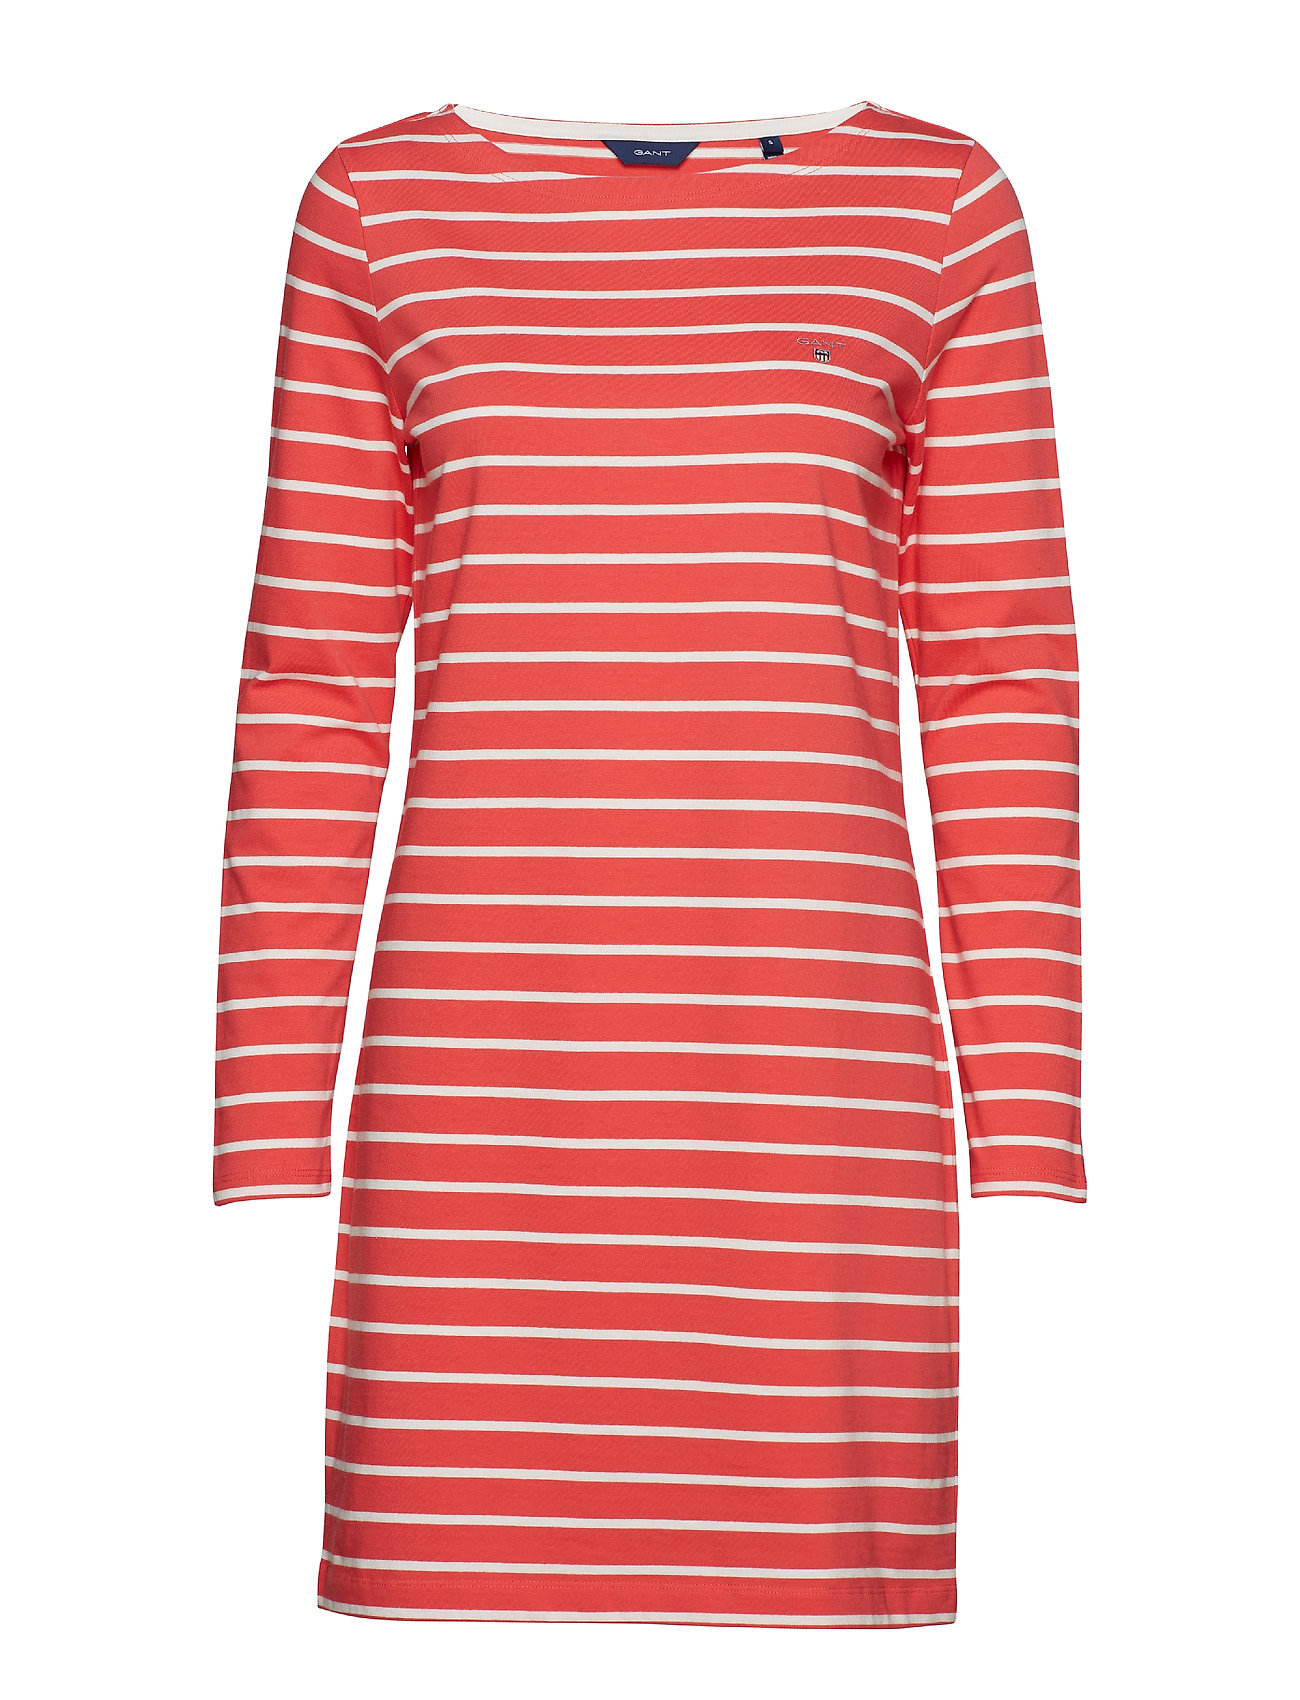 GANT BRETON STRIPE BOATNECK DRESS - WATERMELON RED